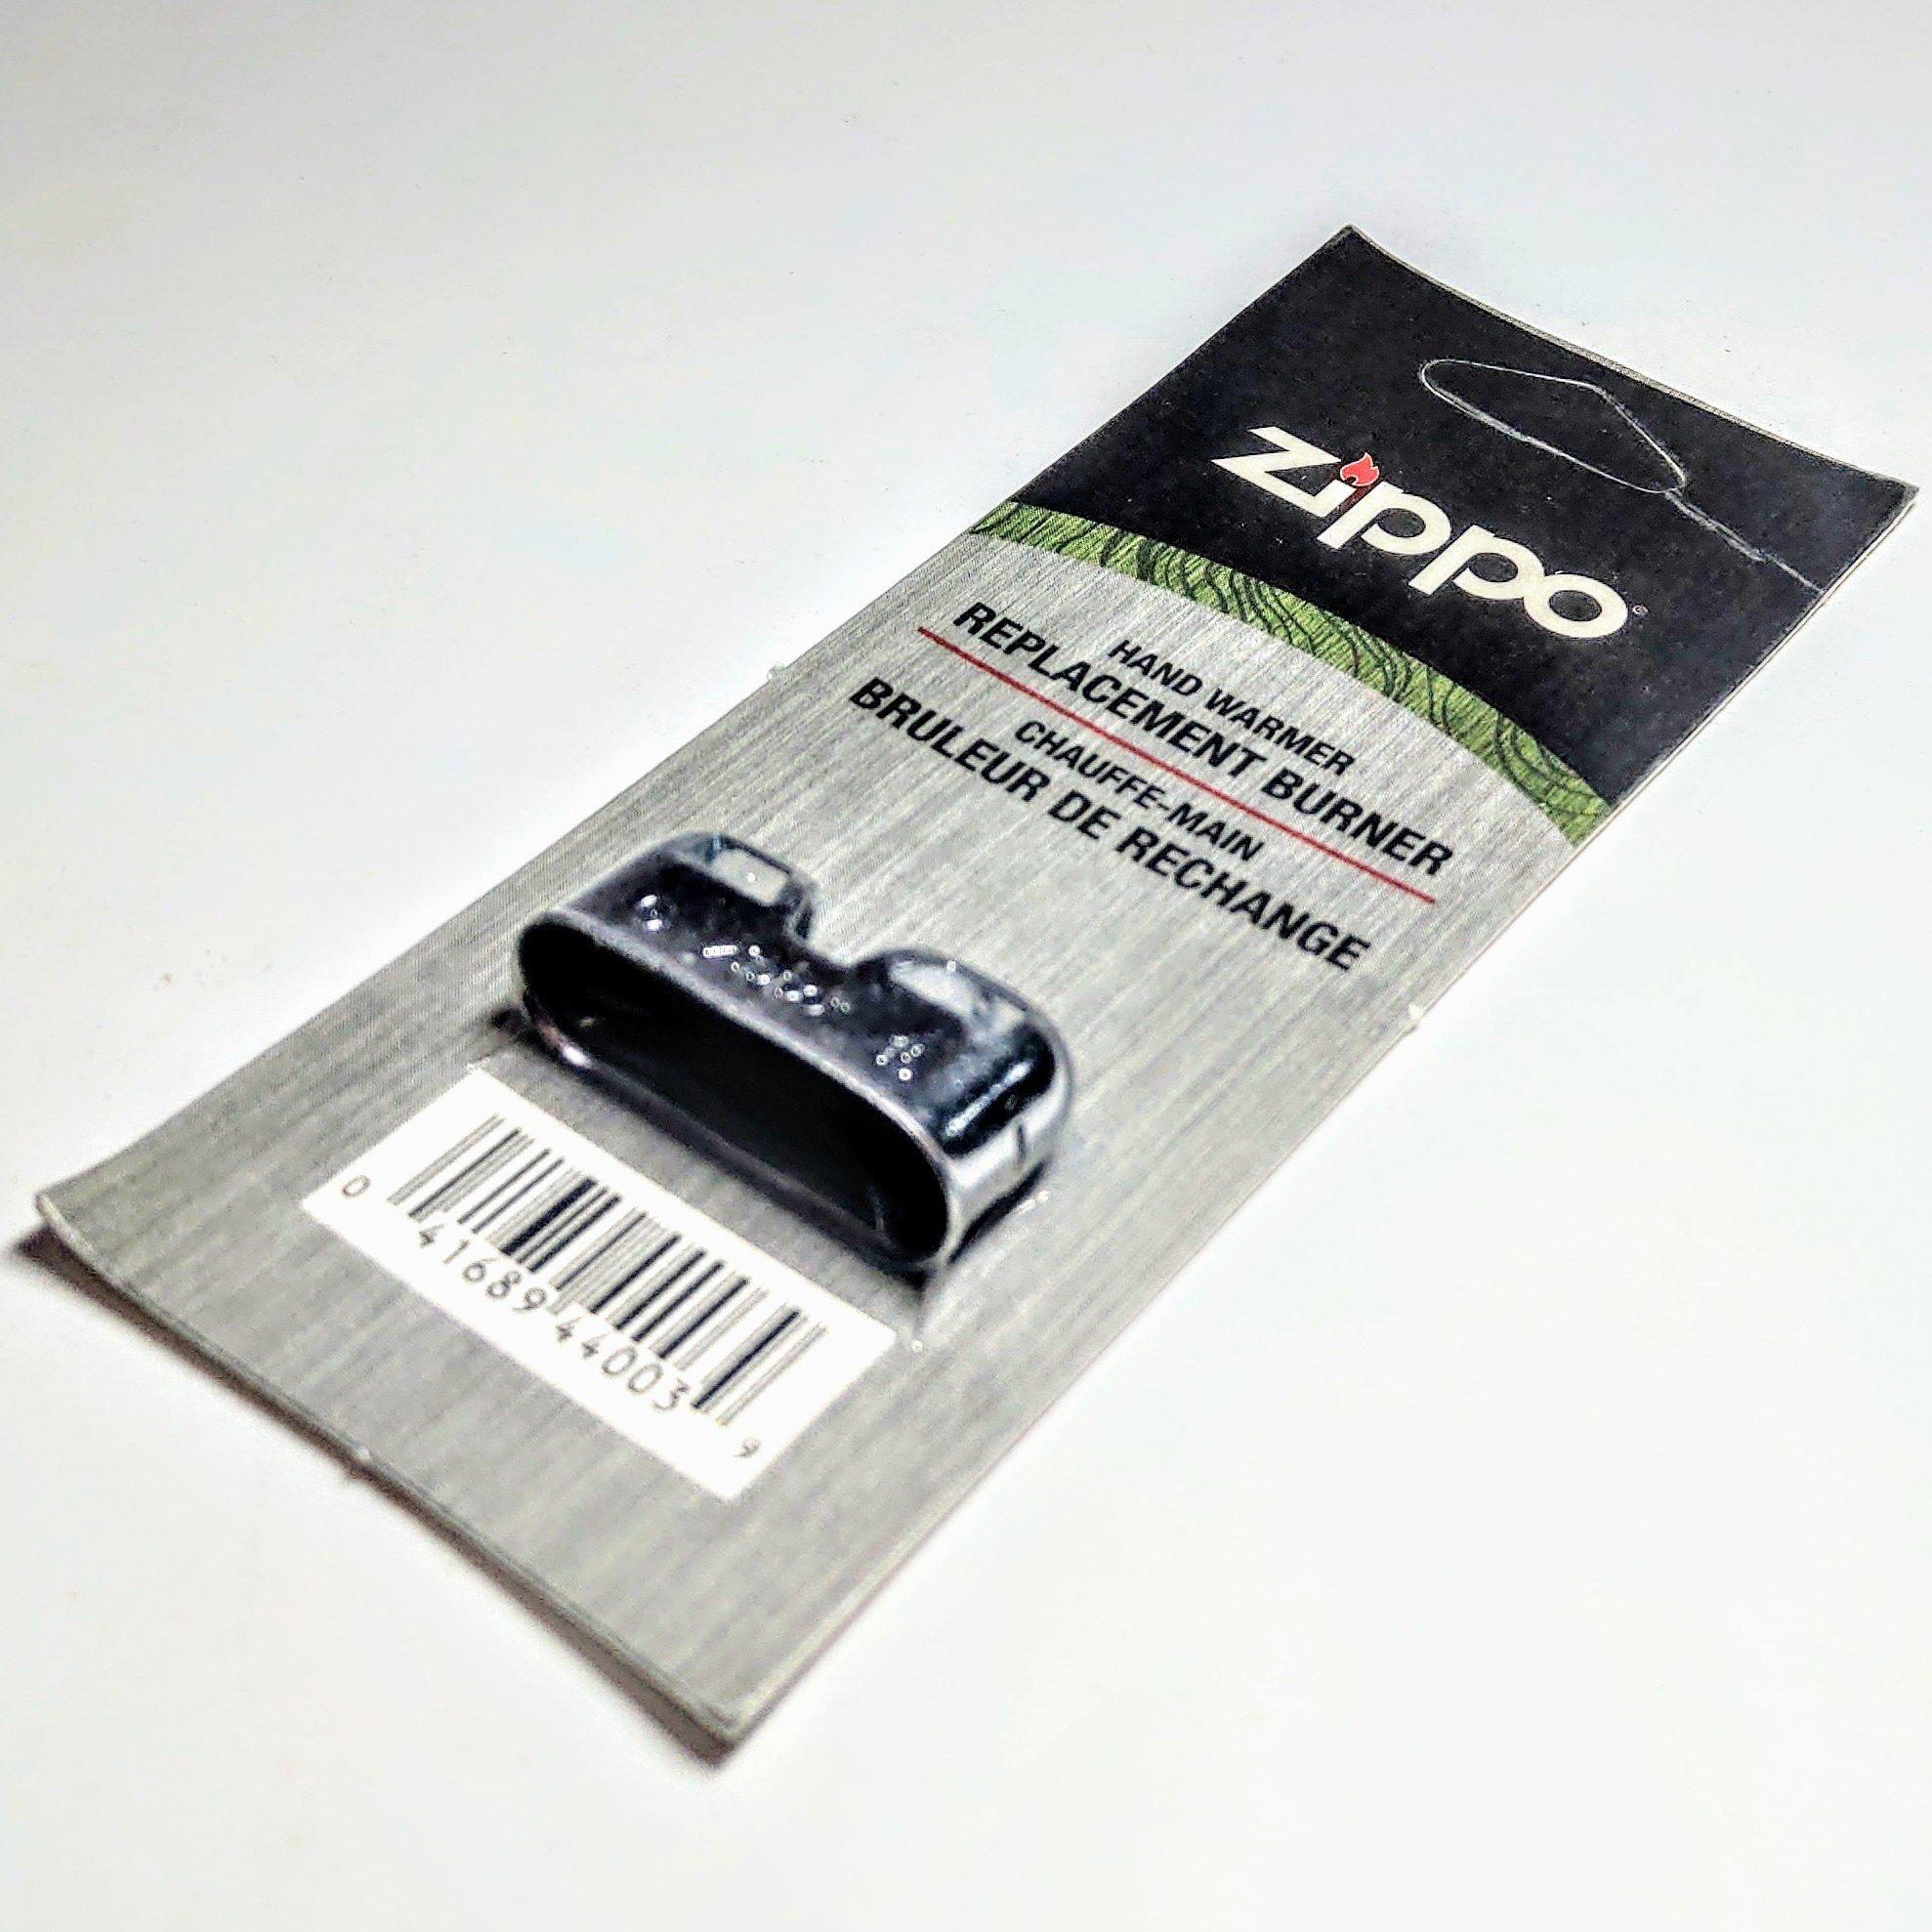 Zippo 白金懷爐 原廠火口 美版另有ZHW-15、ZHW-JF、ZIPPO牌油、美版孔雀懷爐、LAMP白金懷爐